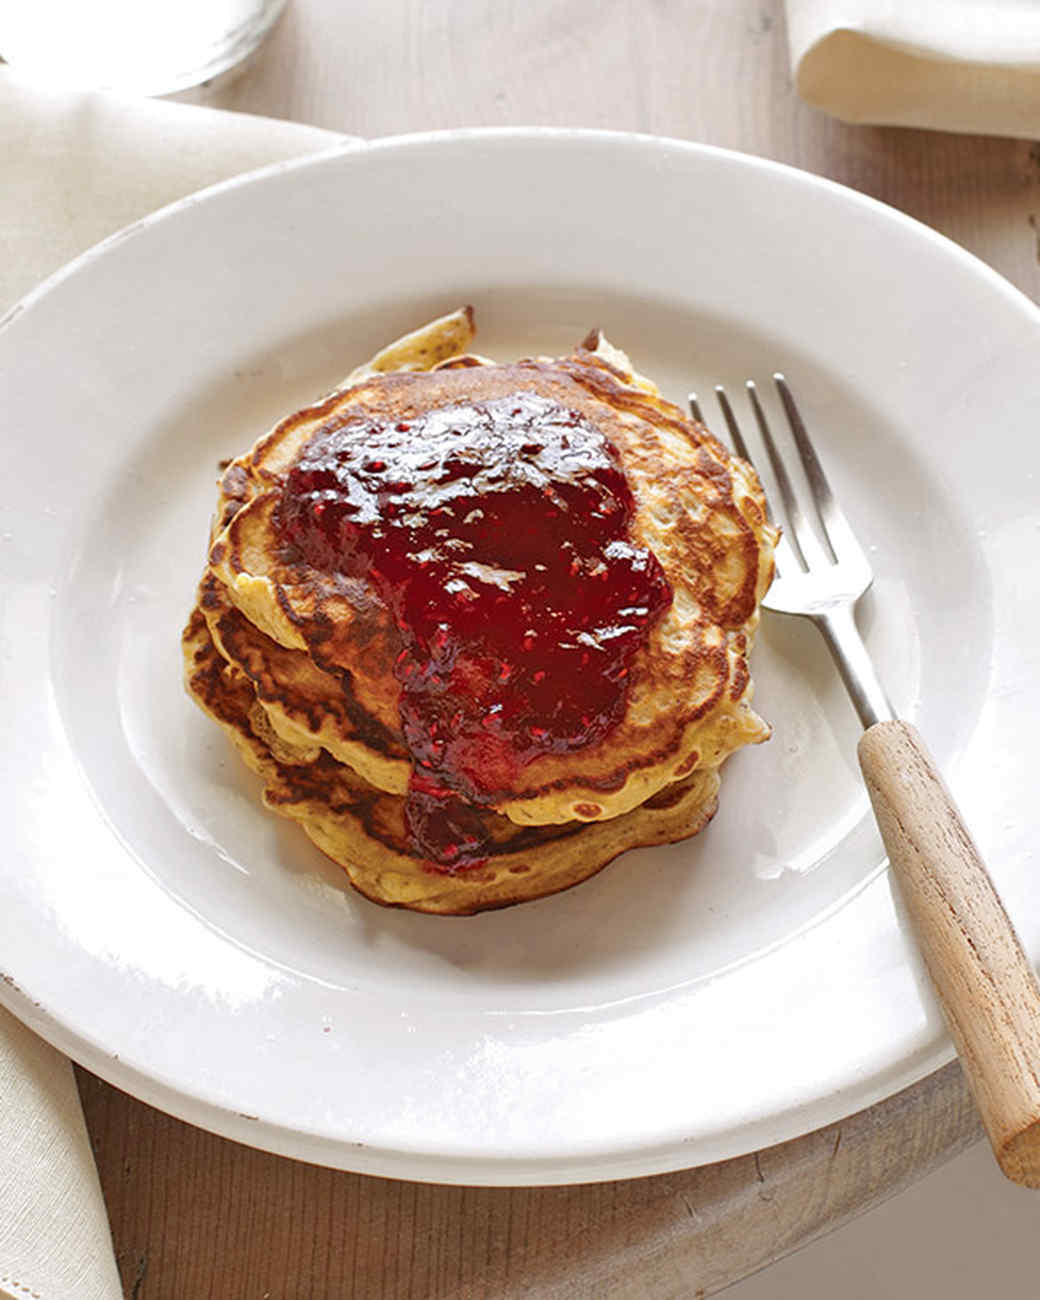 Hazelnut Pancakes with Raspberry Sauce